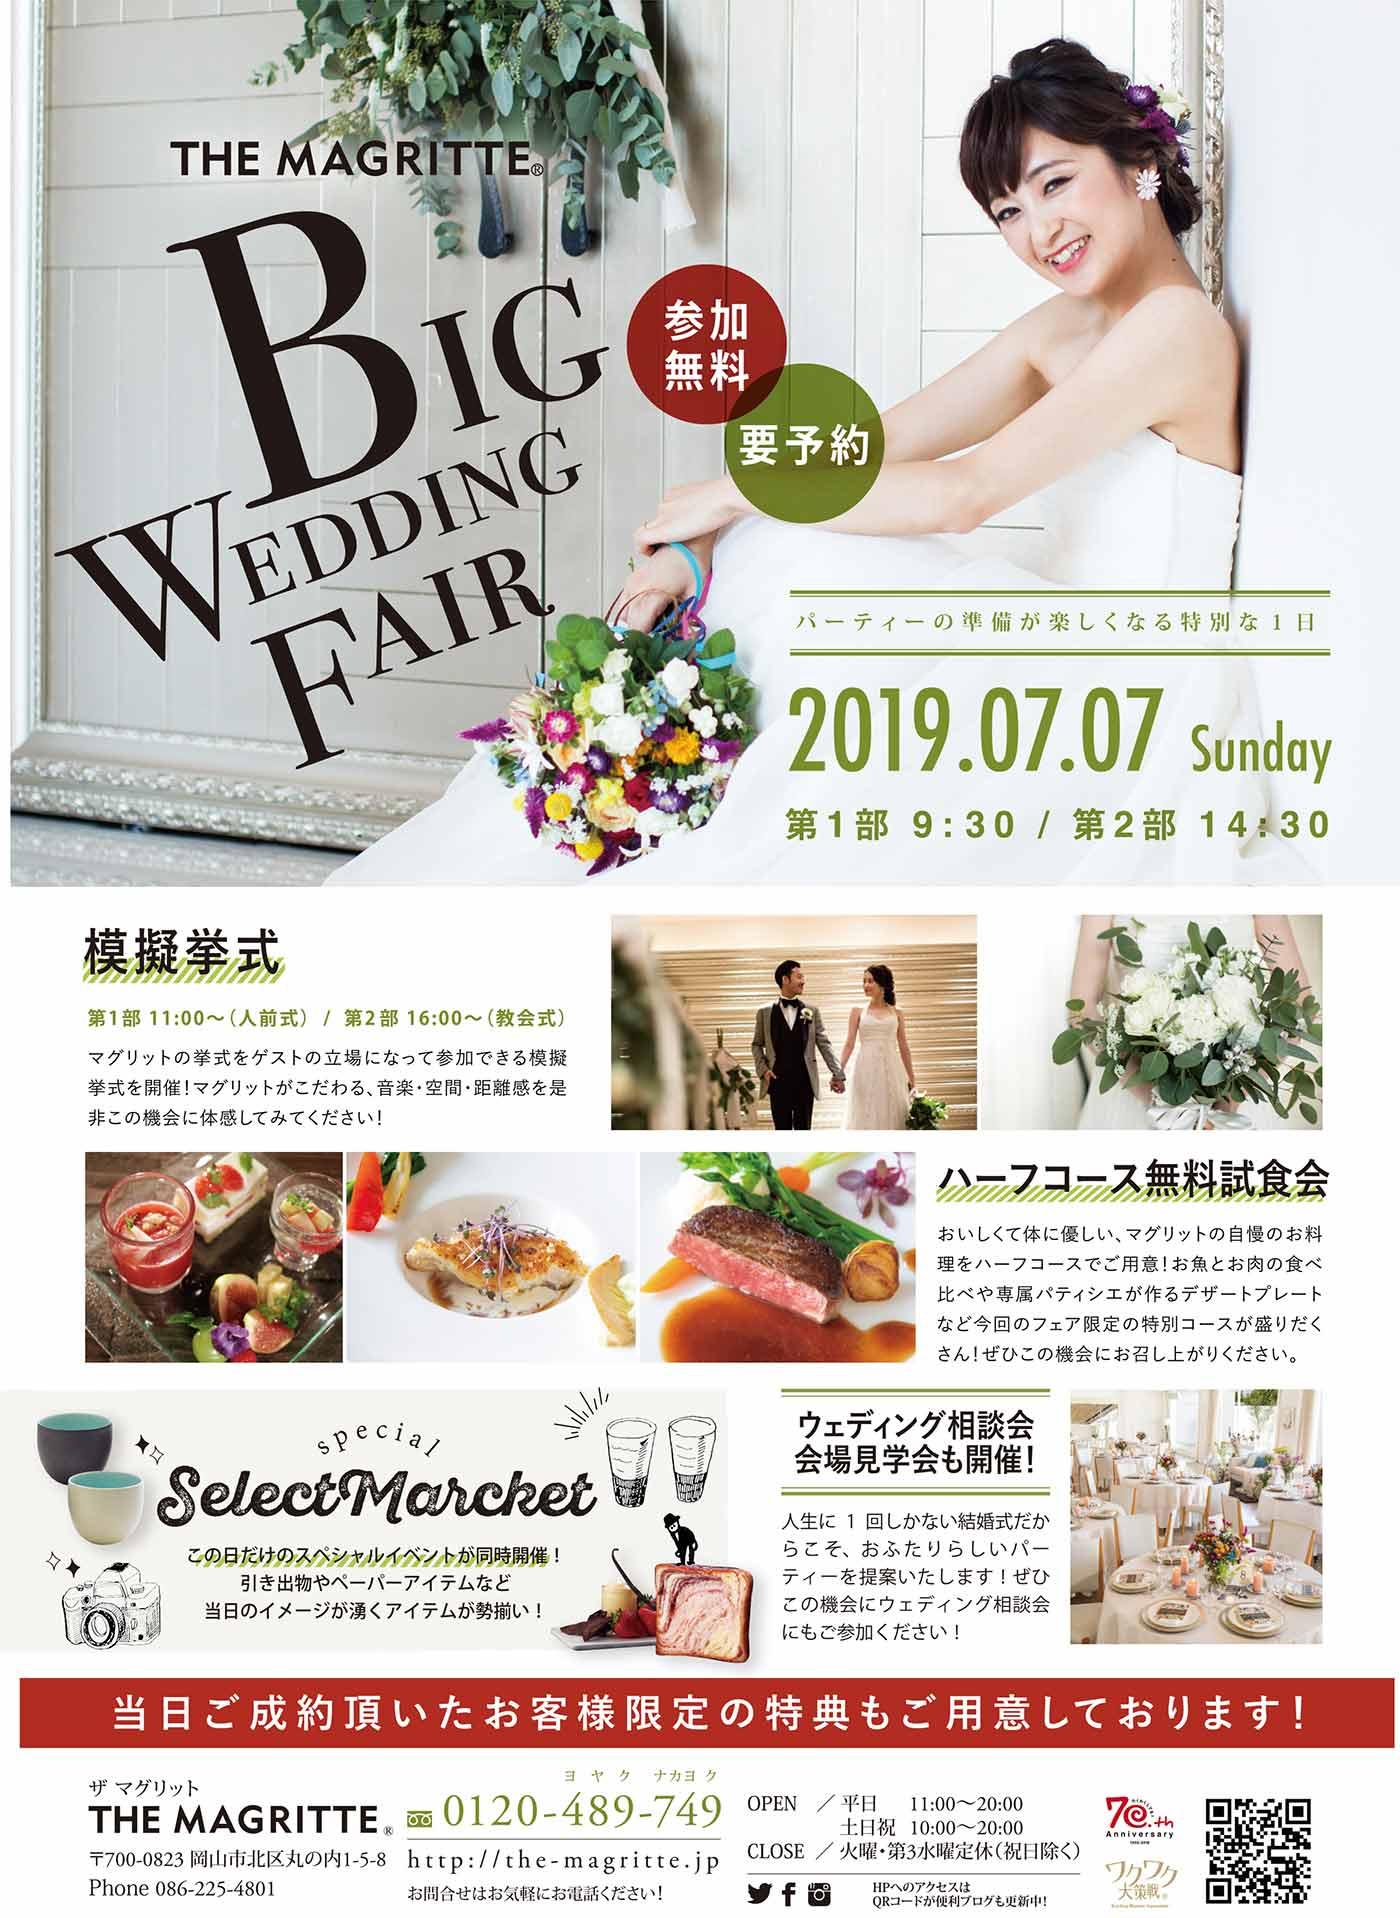 big wedding fair 2019